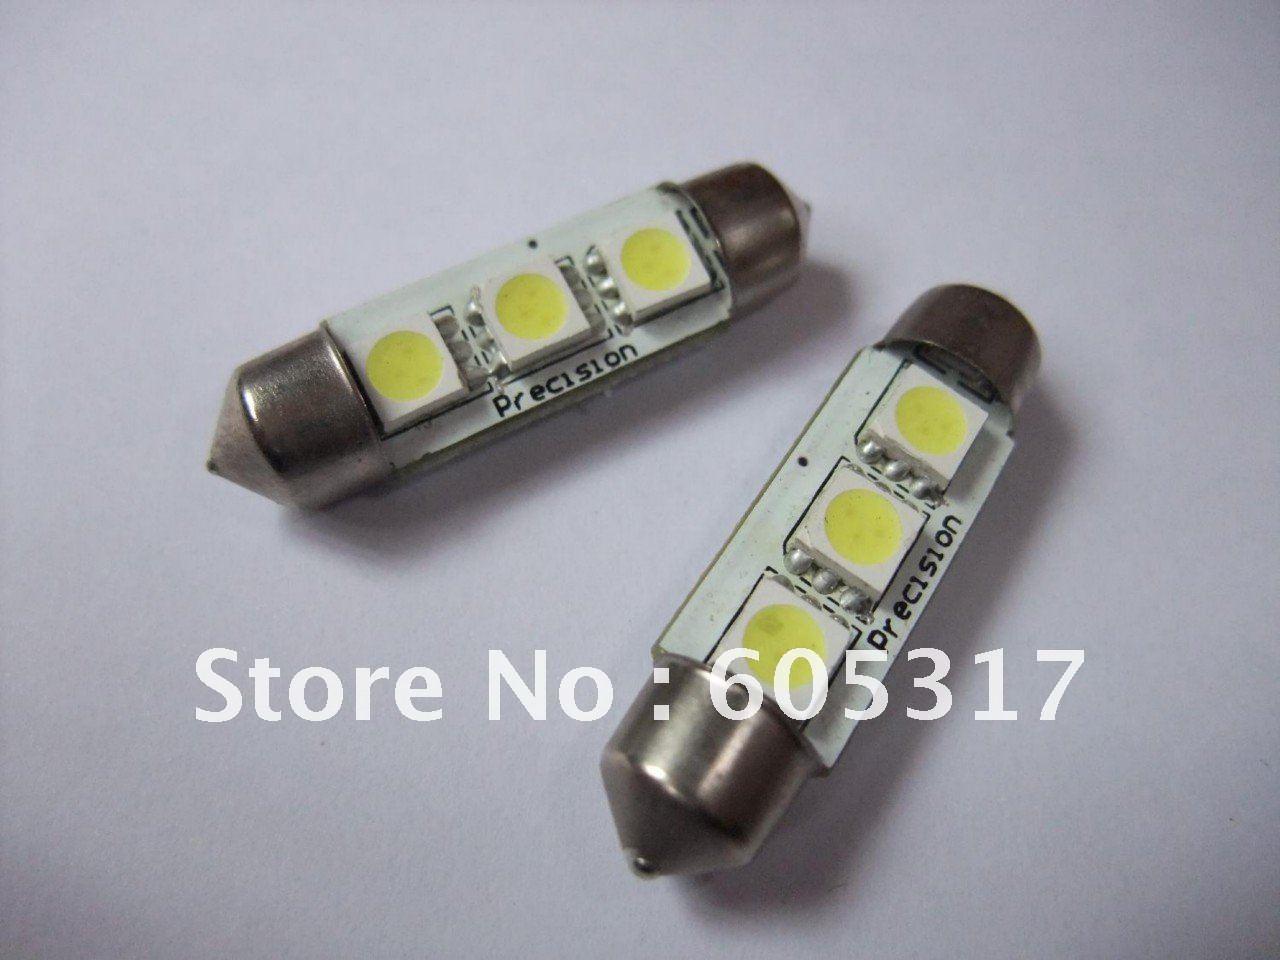 Wholesale 10pcs/lot DC 12V 39mm 3SMD 5050 LED Car Auto Light Bulbs LED License Plate Light LED Festoon Light Bulbs(China (Mainland))